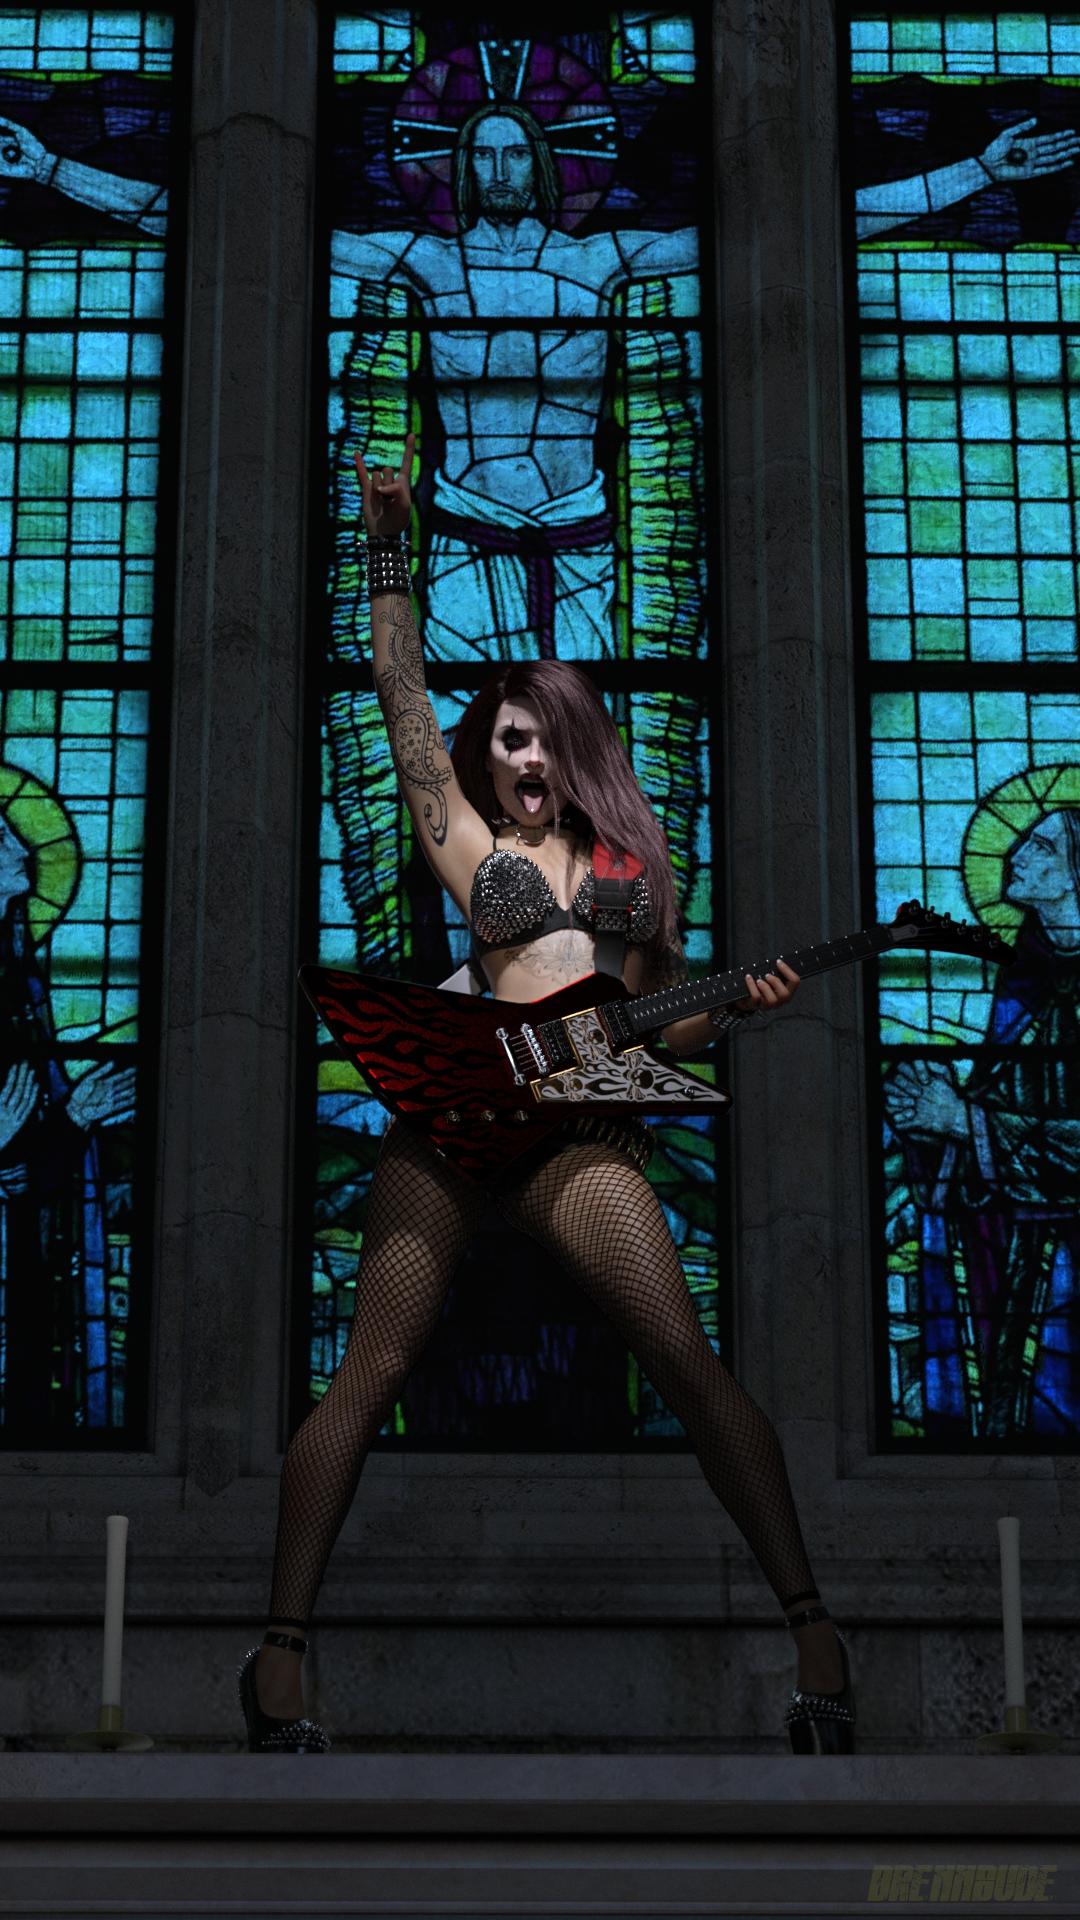 God-Gave-Rock-n-Roll-To-You.jpg